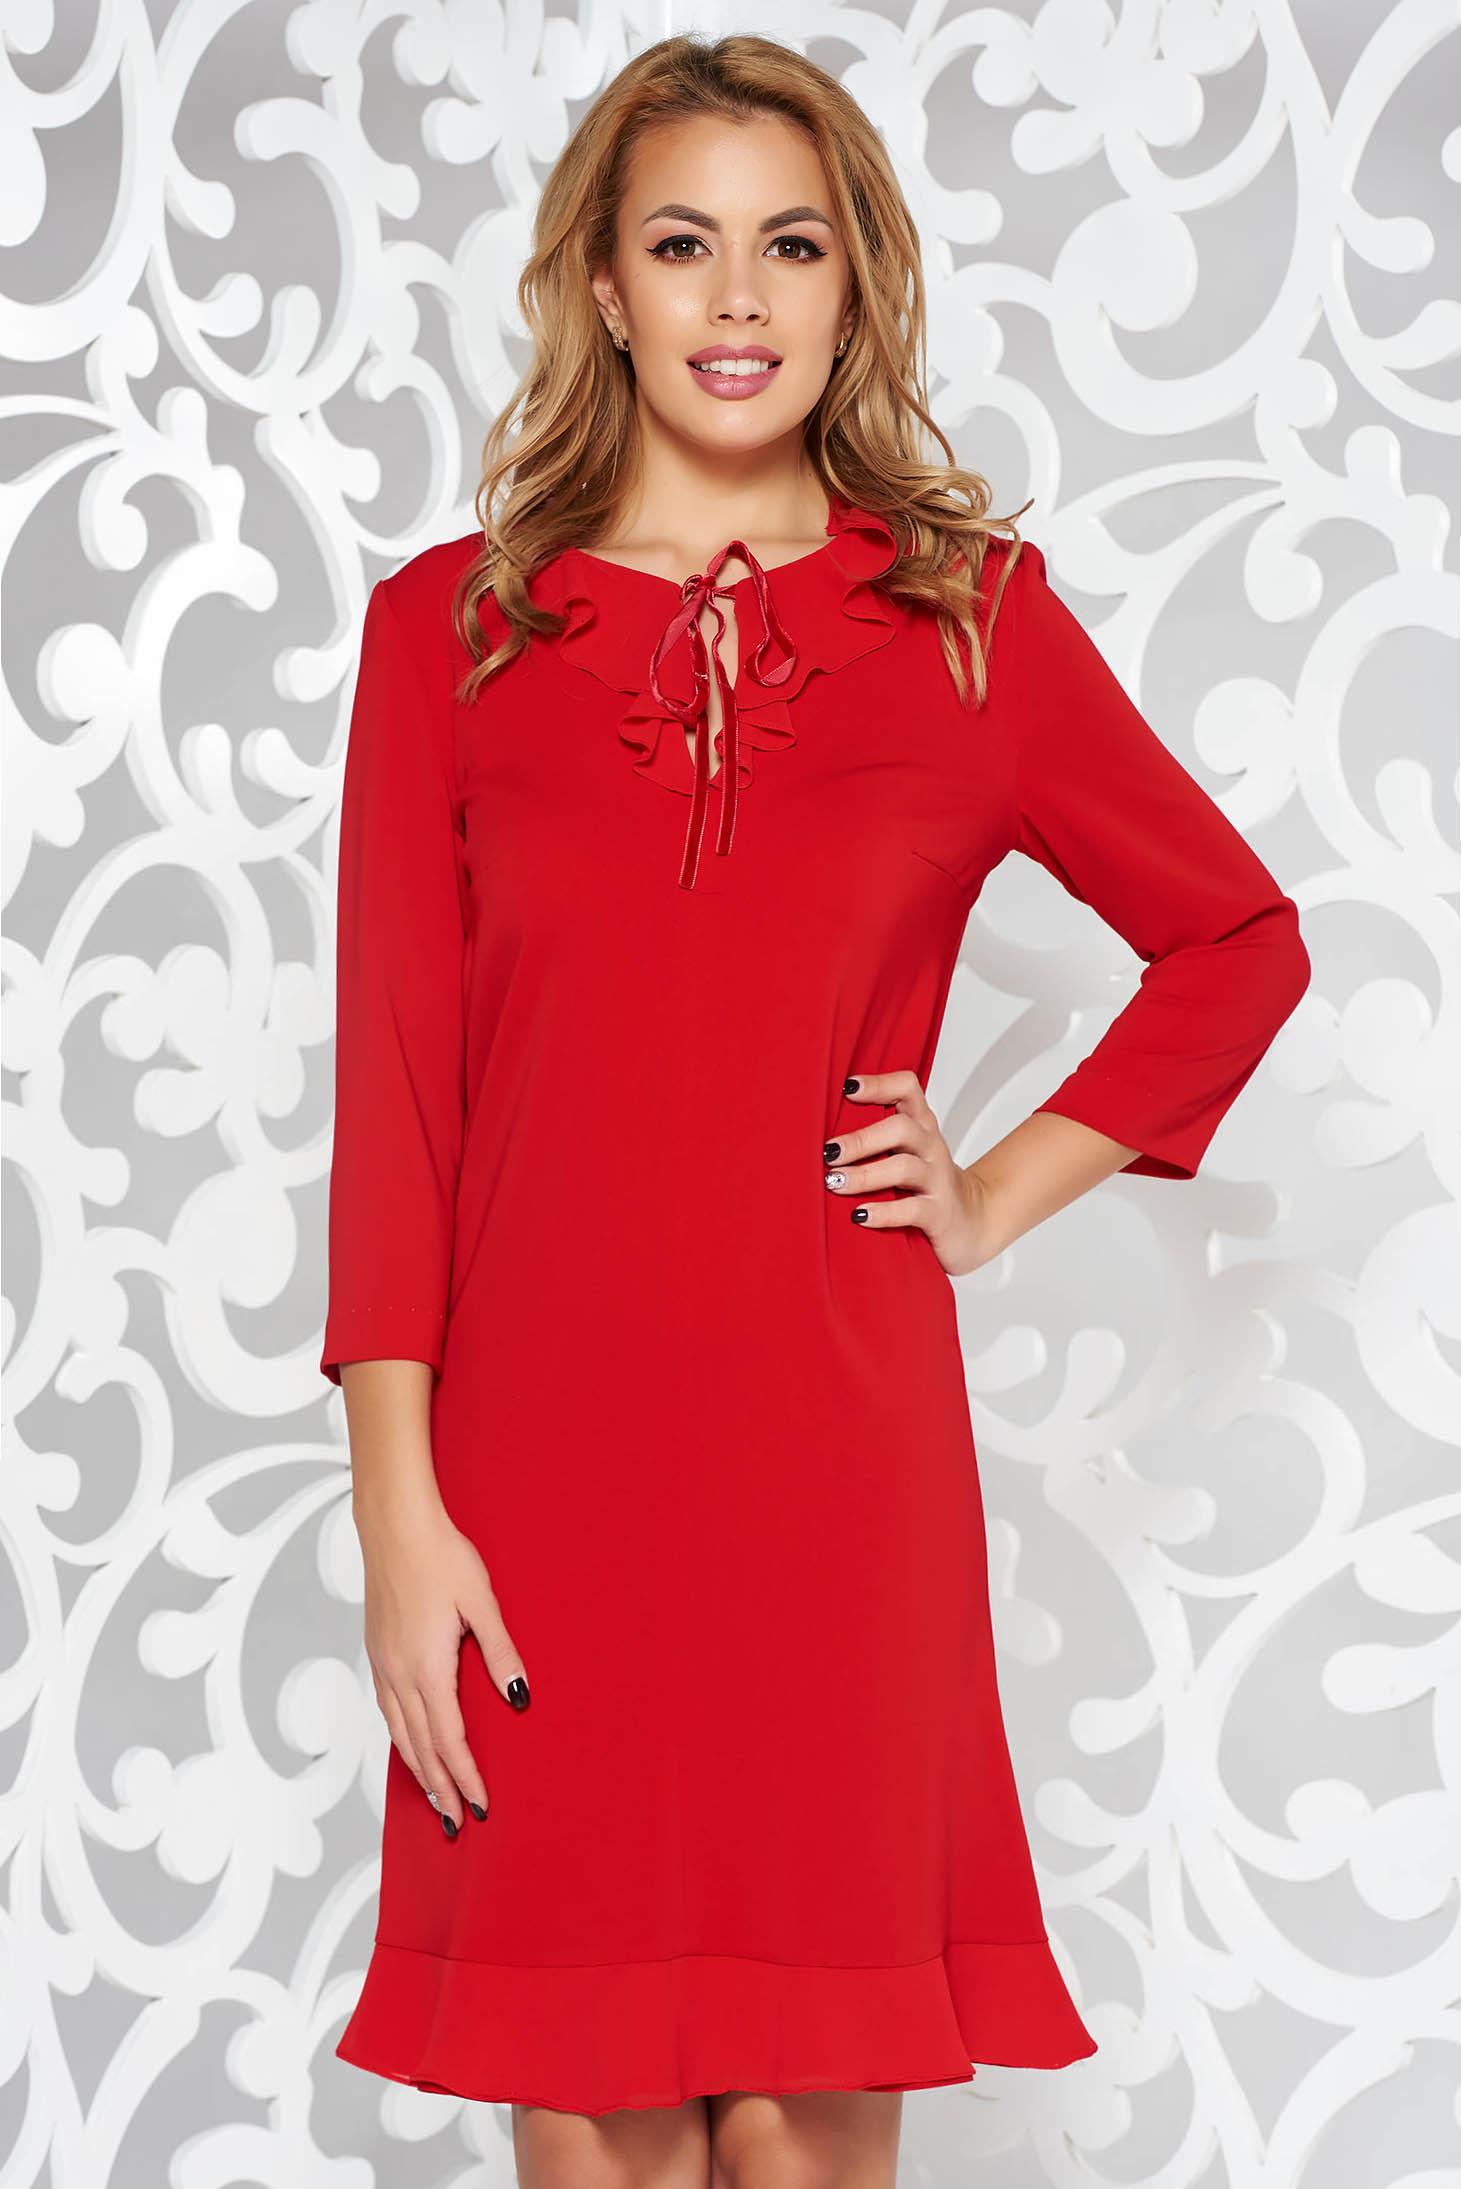 Rochie rosie eleganta cu un croi drept cu maneca 3/4 din material usor elastic cu volanase la baza rochiei